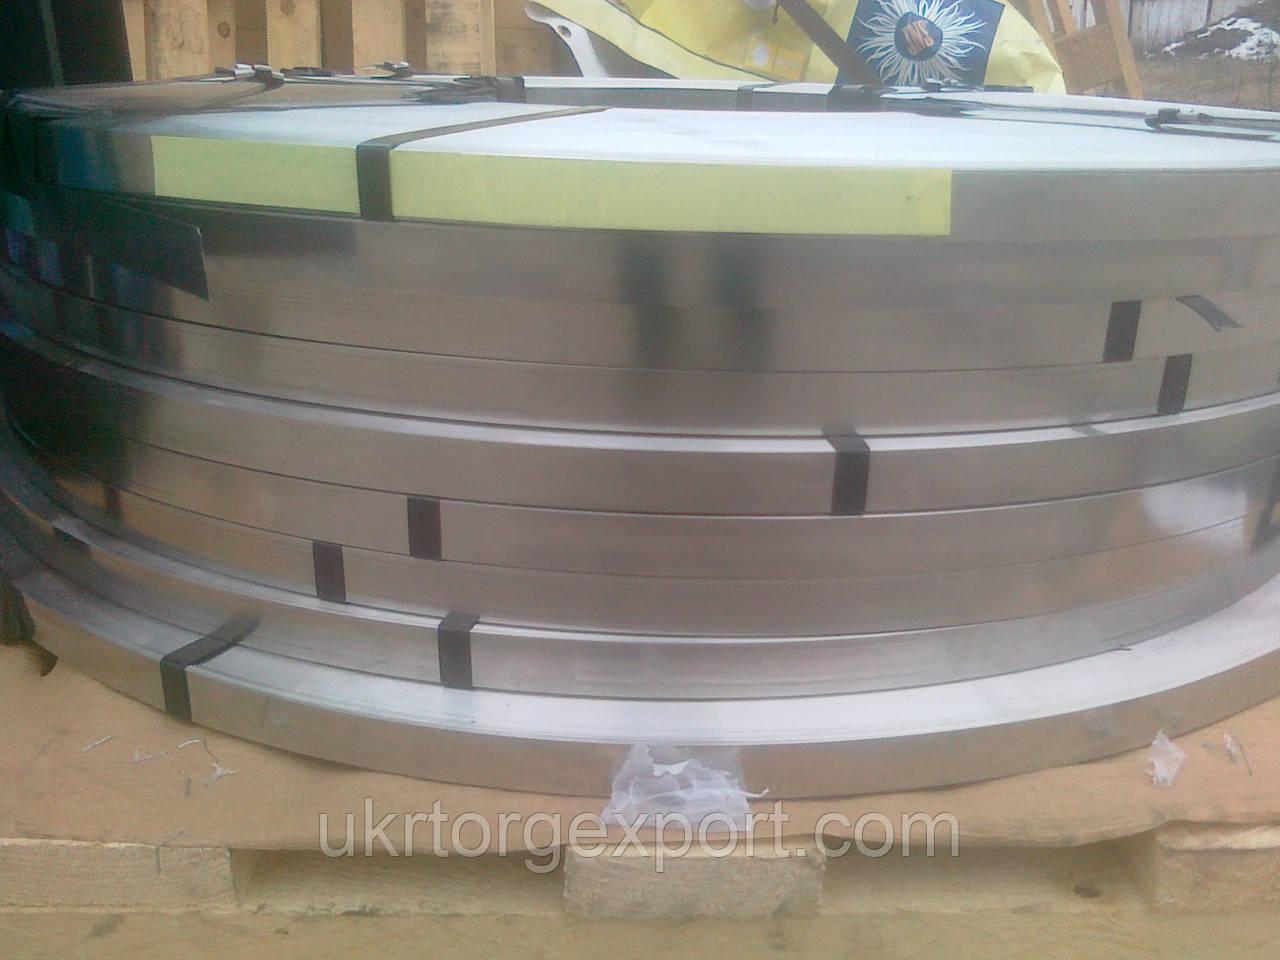 Лента фехраль Х23Ю5Т (OCr23Al5) 0,15*1,0 мм